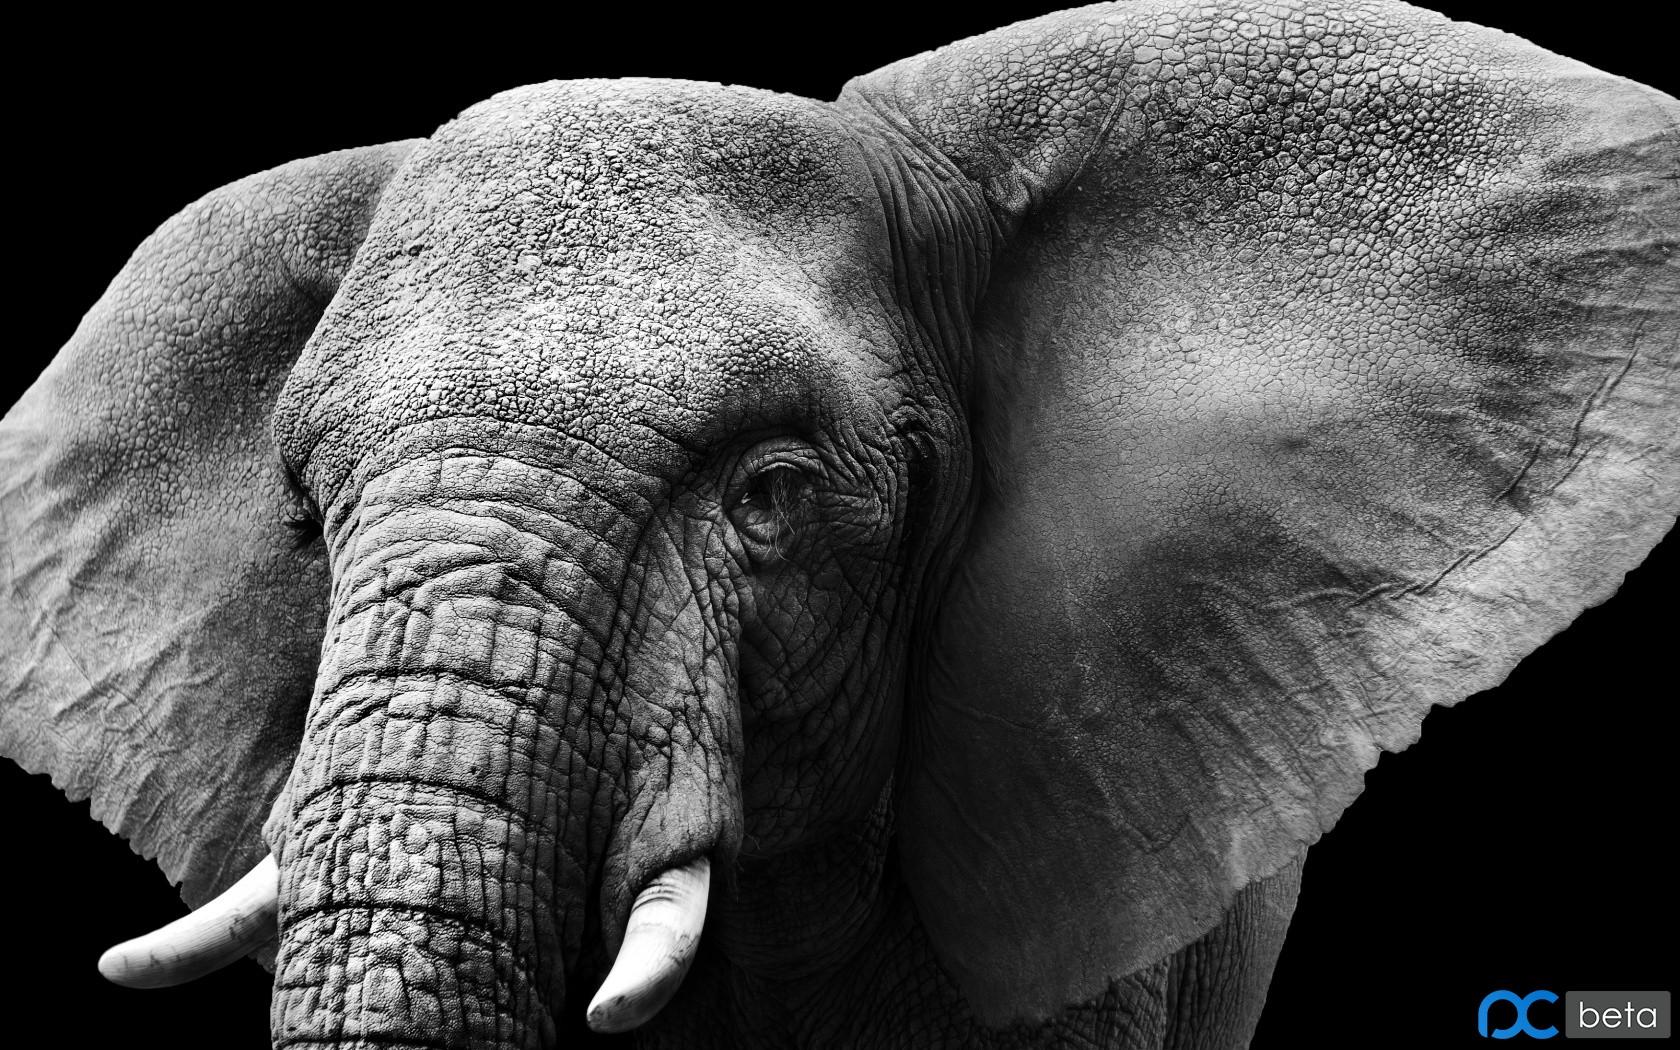 elephant-tusks-ears-ivory.jpg